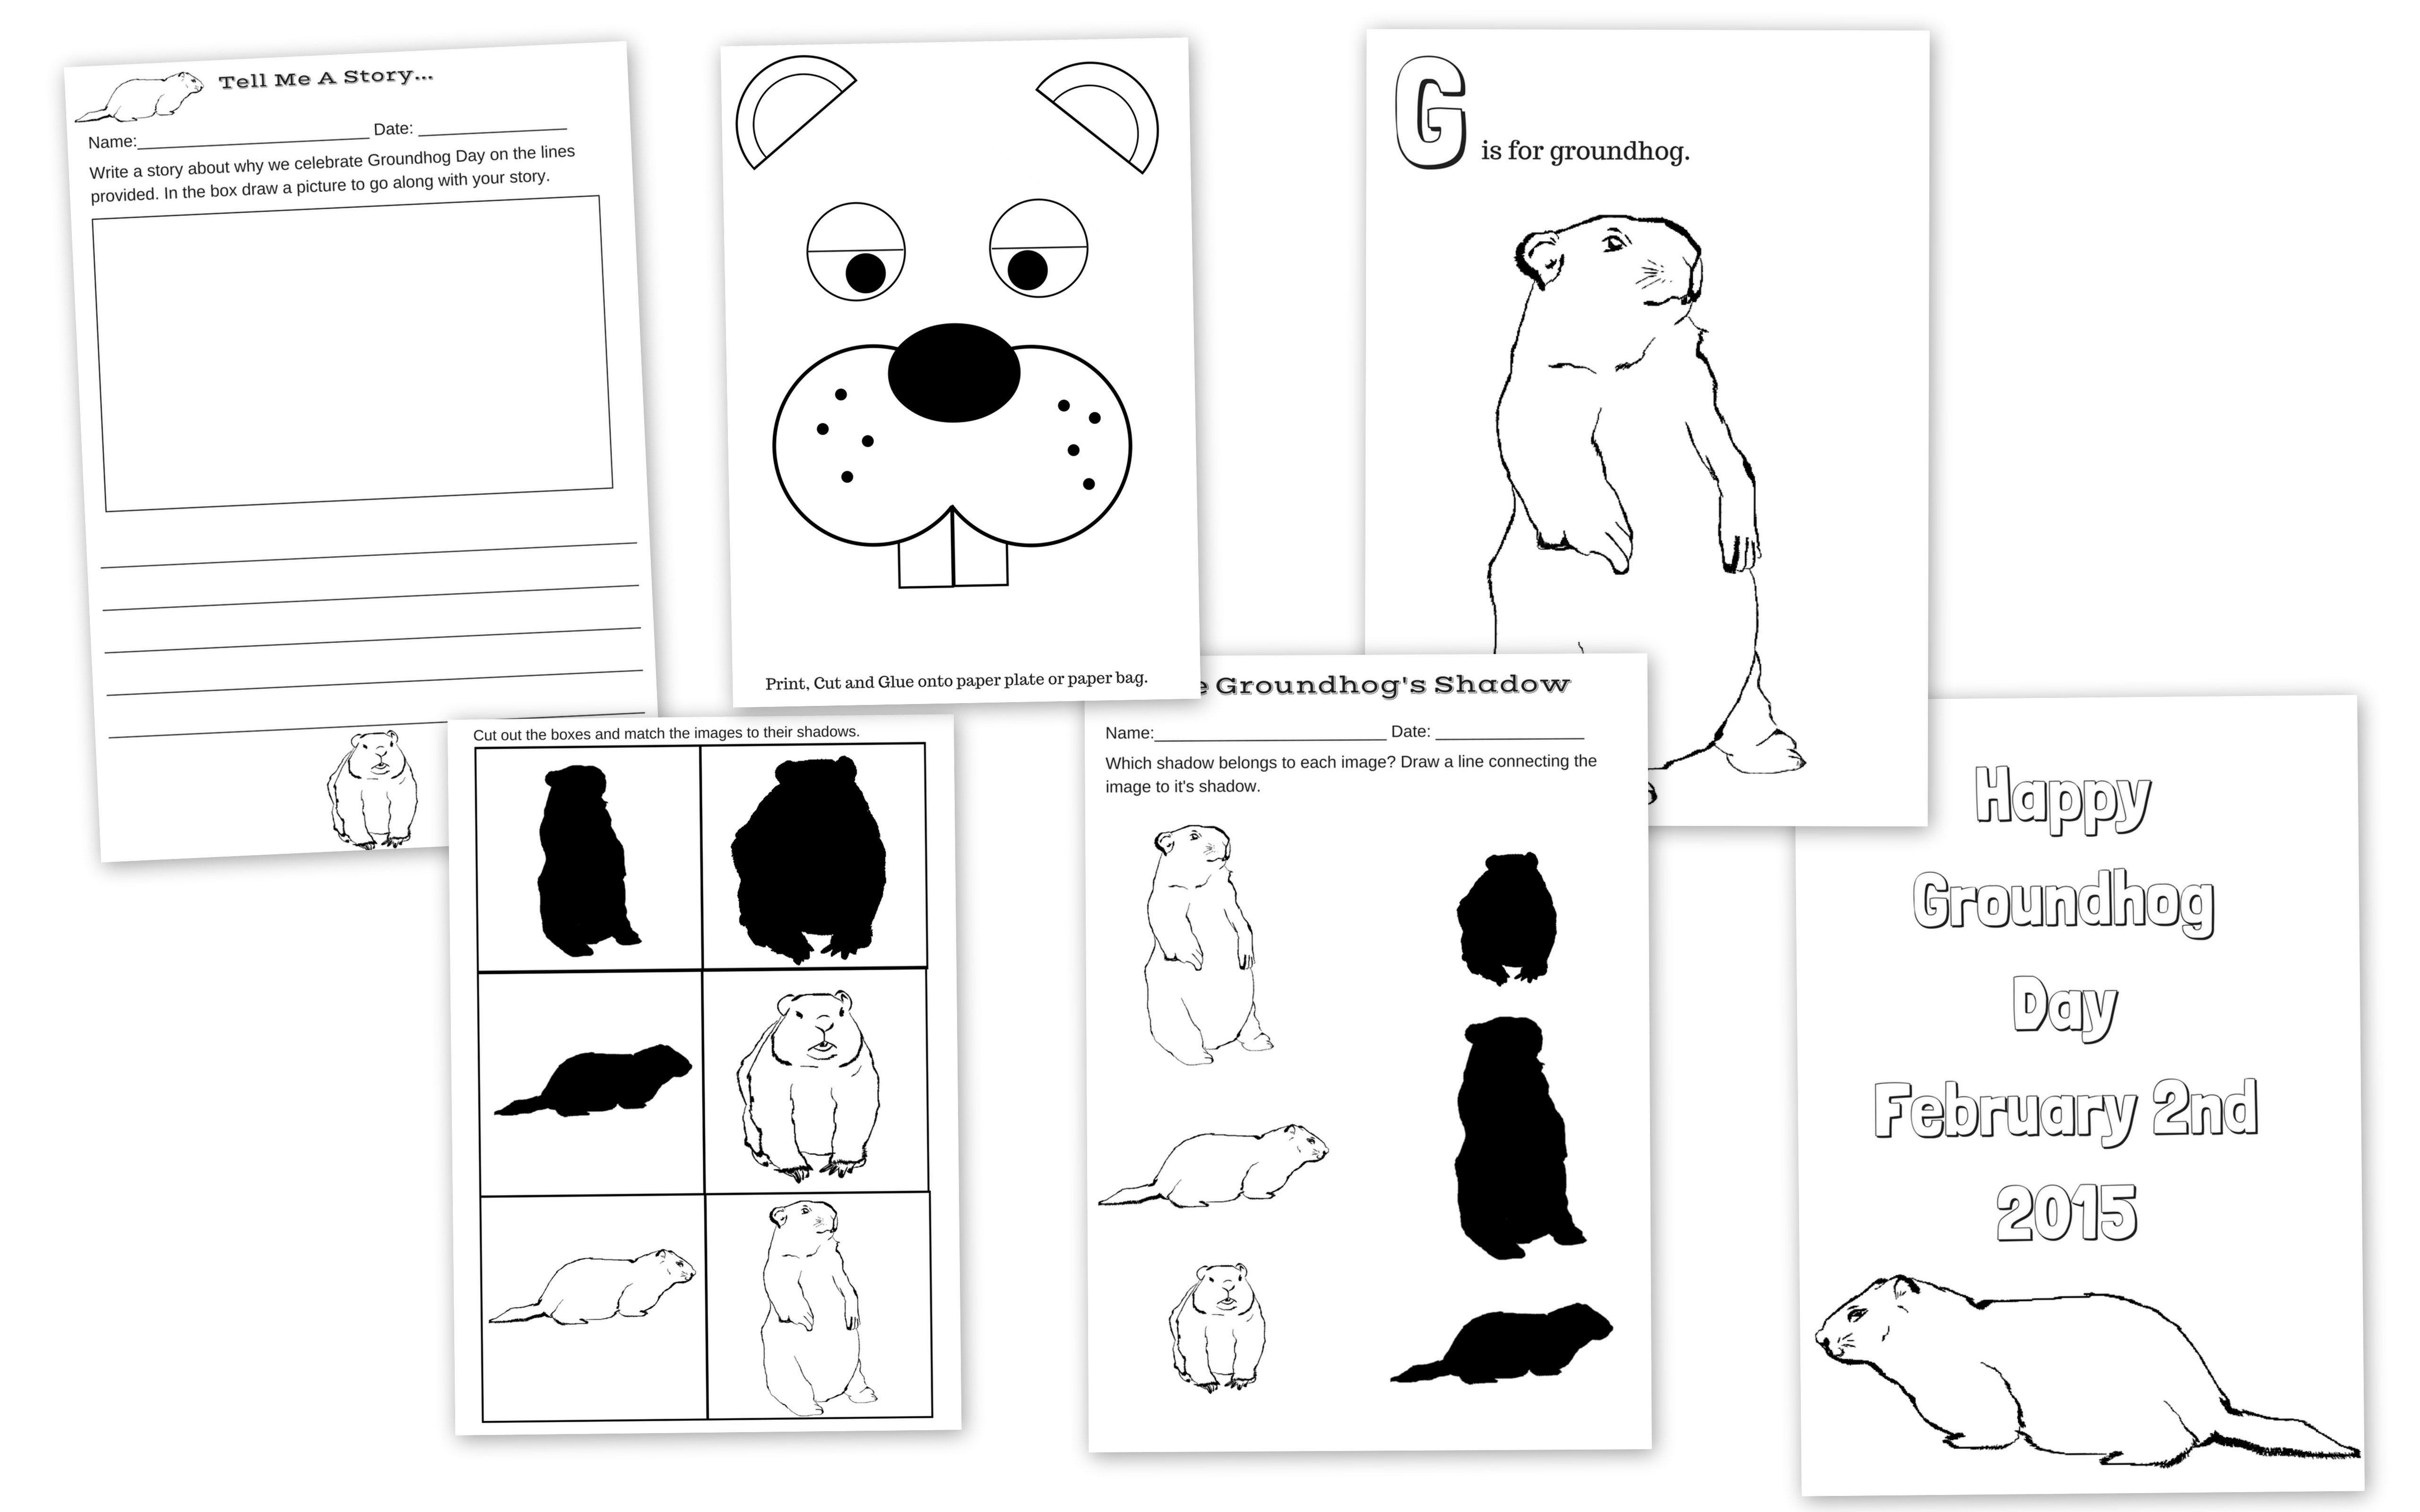 Happy Groundhog Day Groundhog Day Free Printable Activity